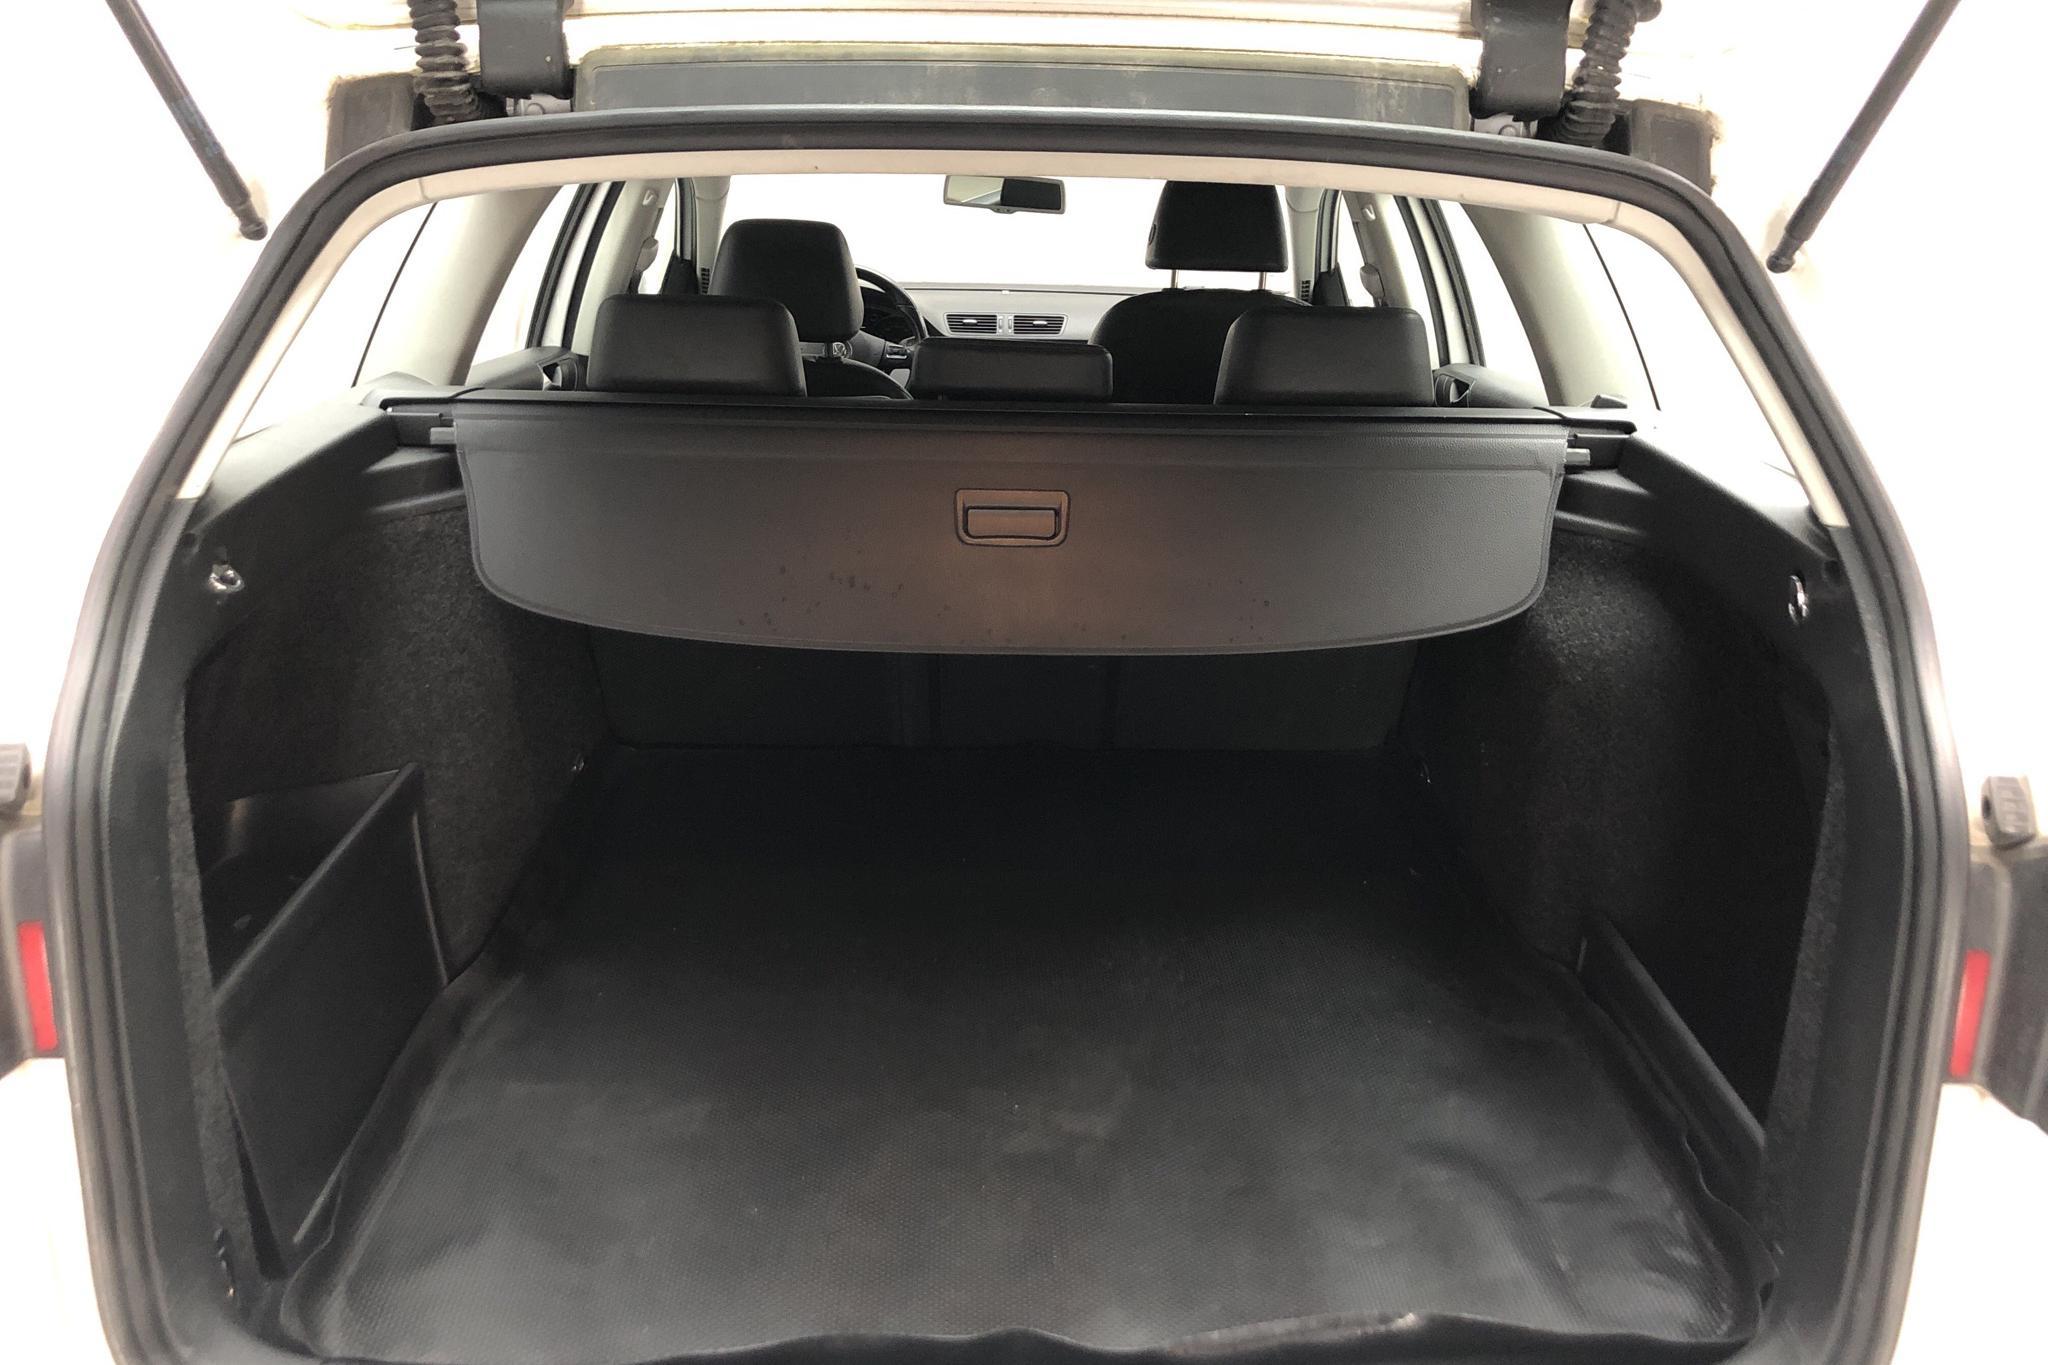 VW Passat 2.0 TDI 4-Motion Variant (170hk) - 213 810 km - Automatic - white - 2010